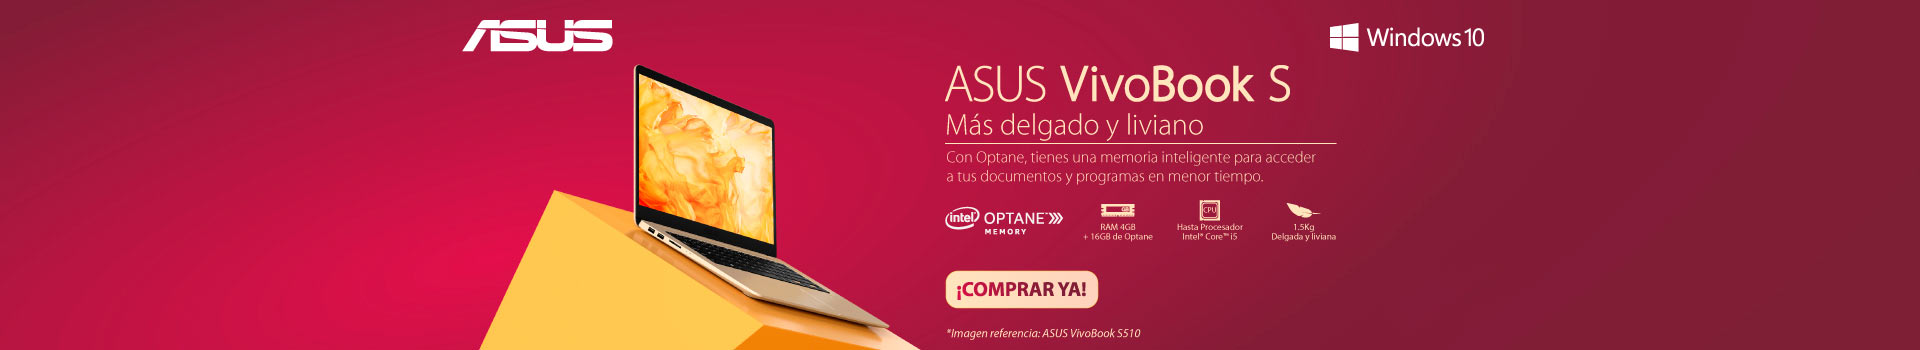 AK-KT-HIPER-3-computadores y tablets-PP-EXP-Asus-Asus VivoBook S-dic15